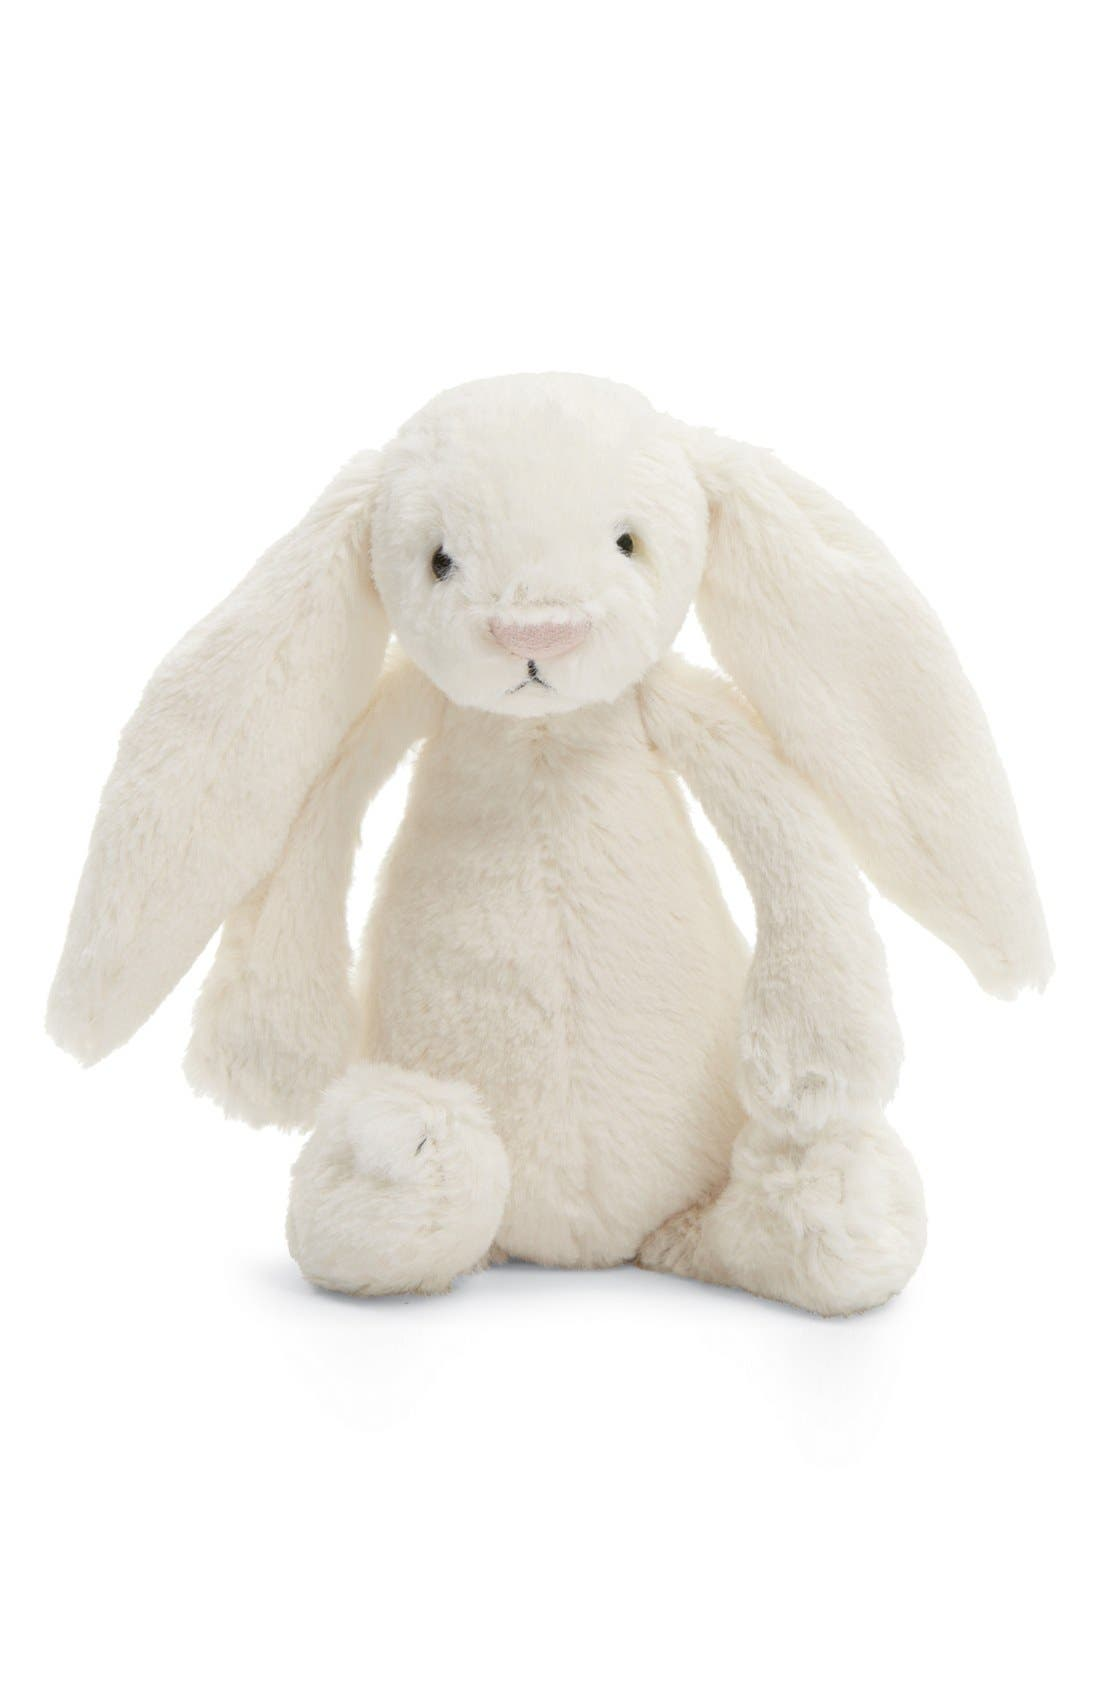 'Large Bashful Bunny' Stuffed Animal,                             Main thumbnail 1, color,                             CREAM